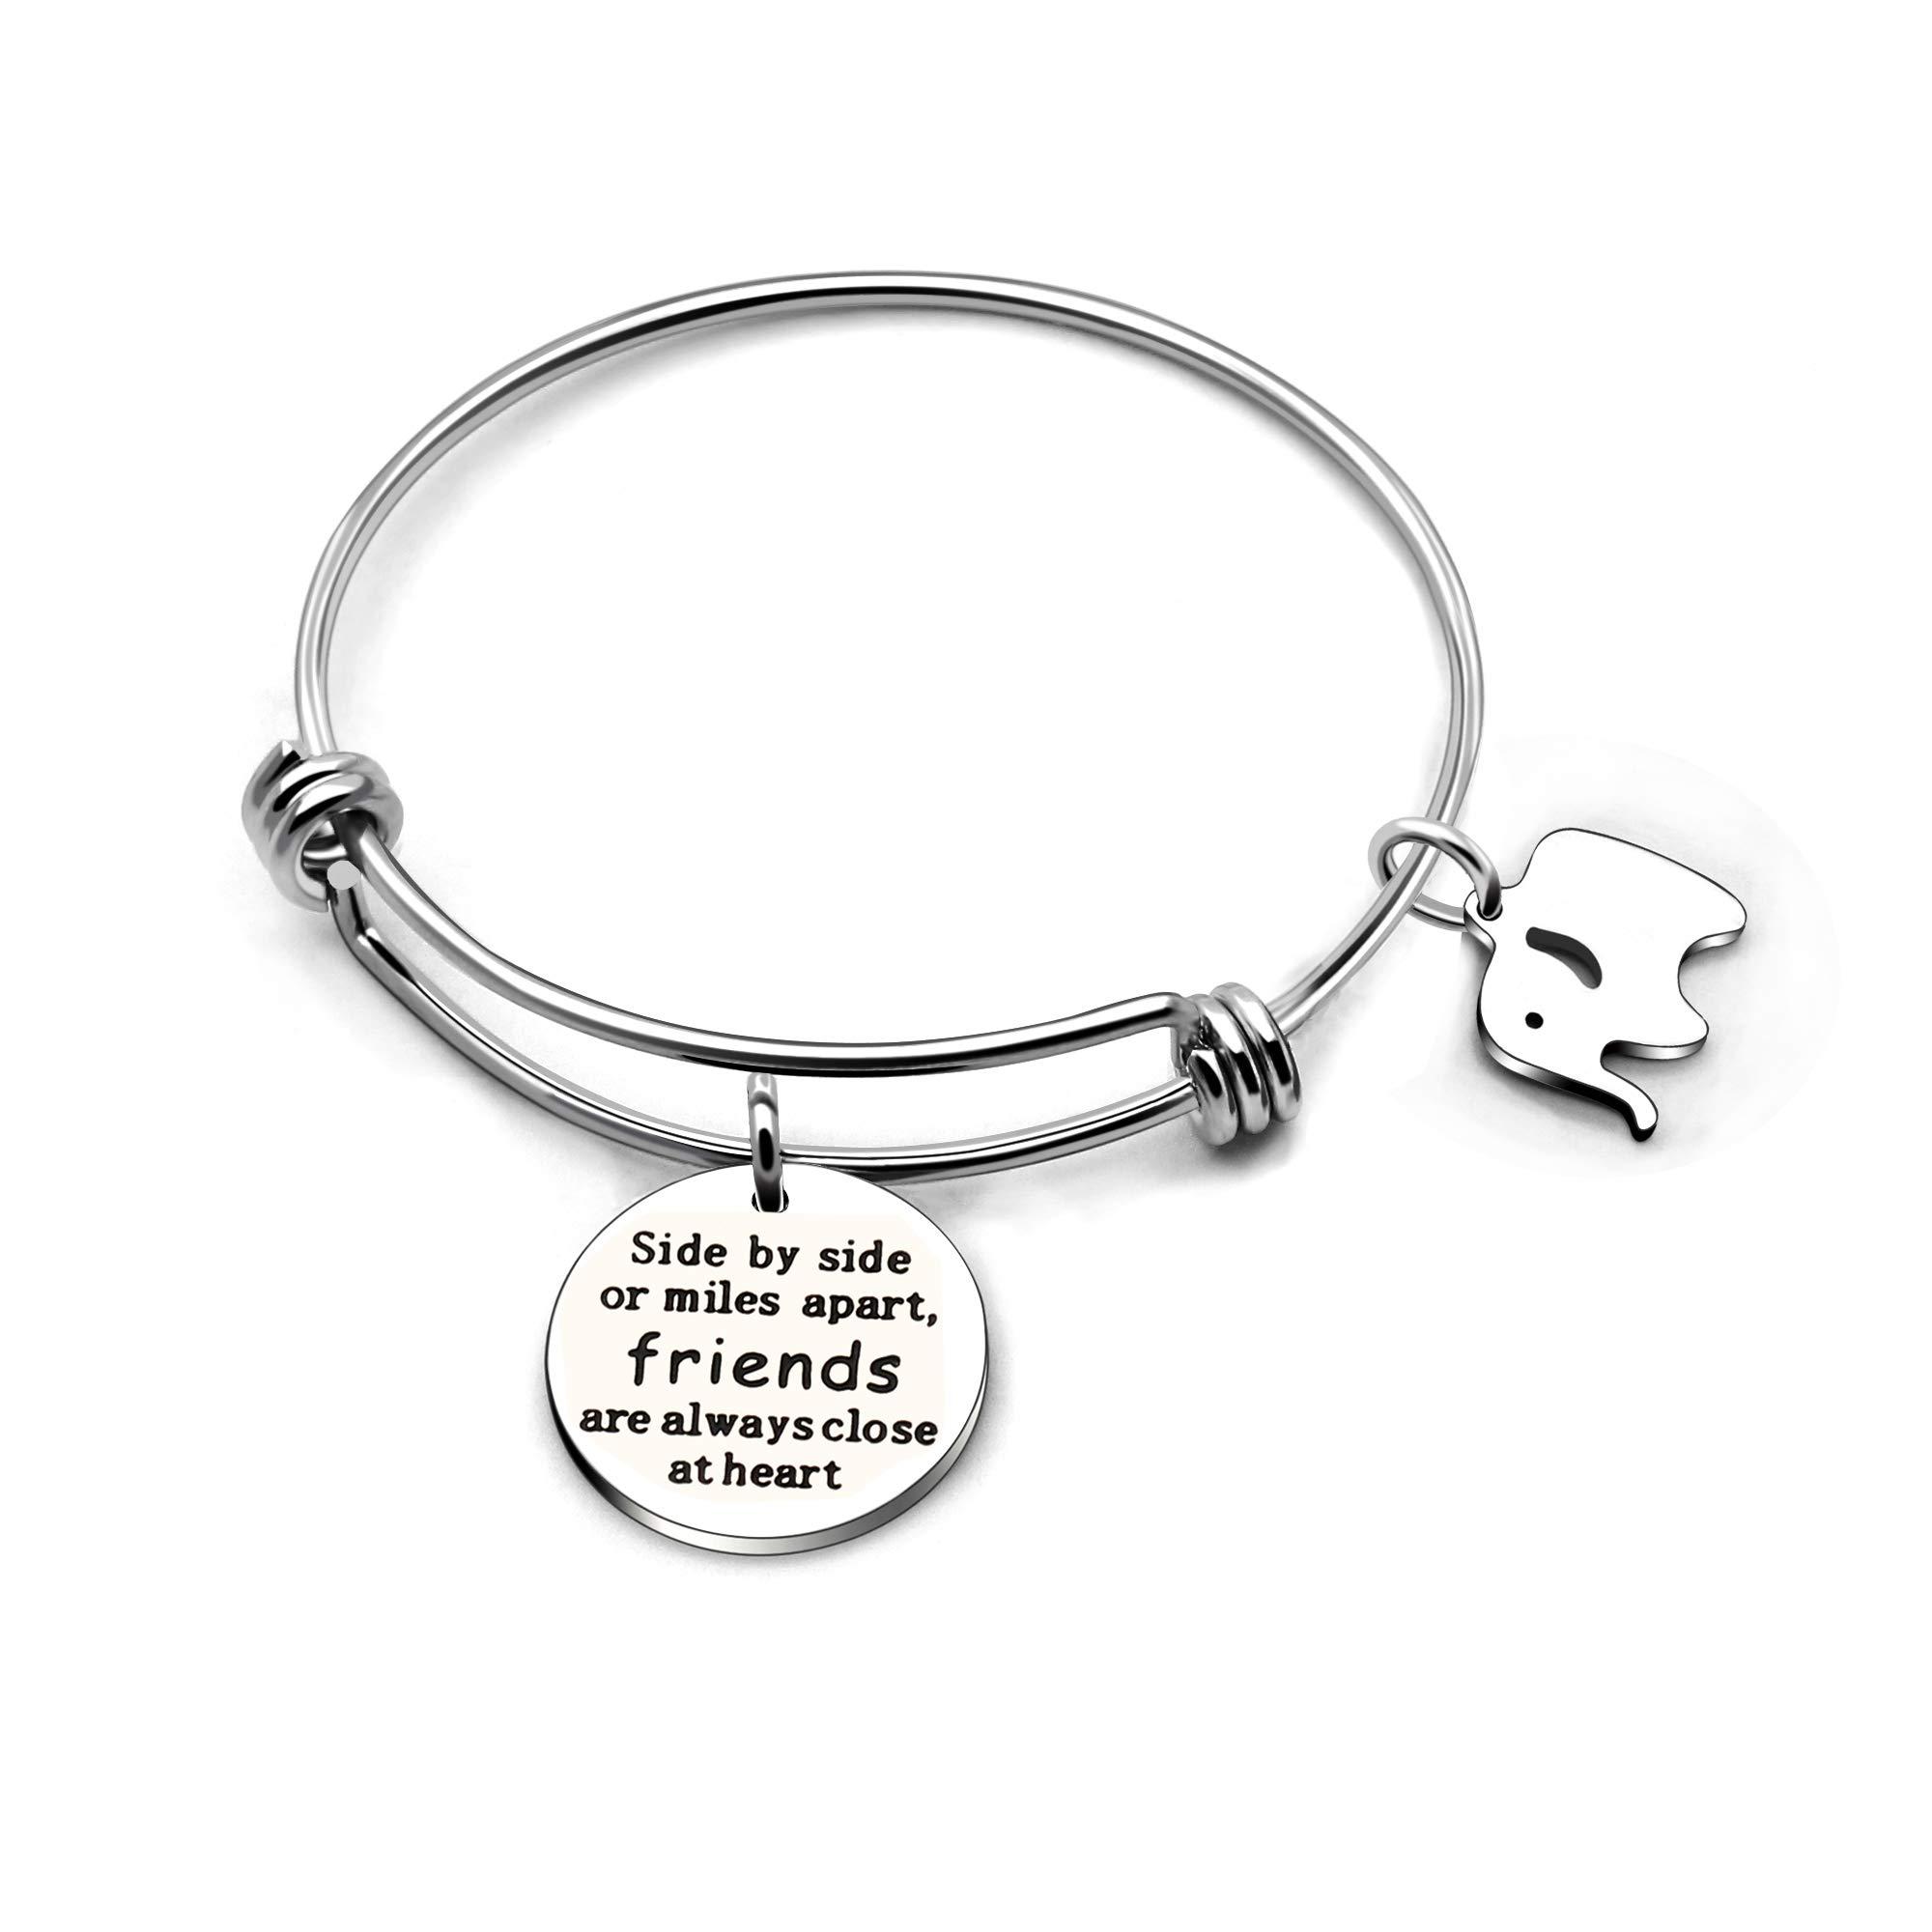 CAROMAY Bangle Bracelet Lucky Elephant Friendship Bestie Stainless Steel